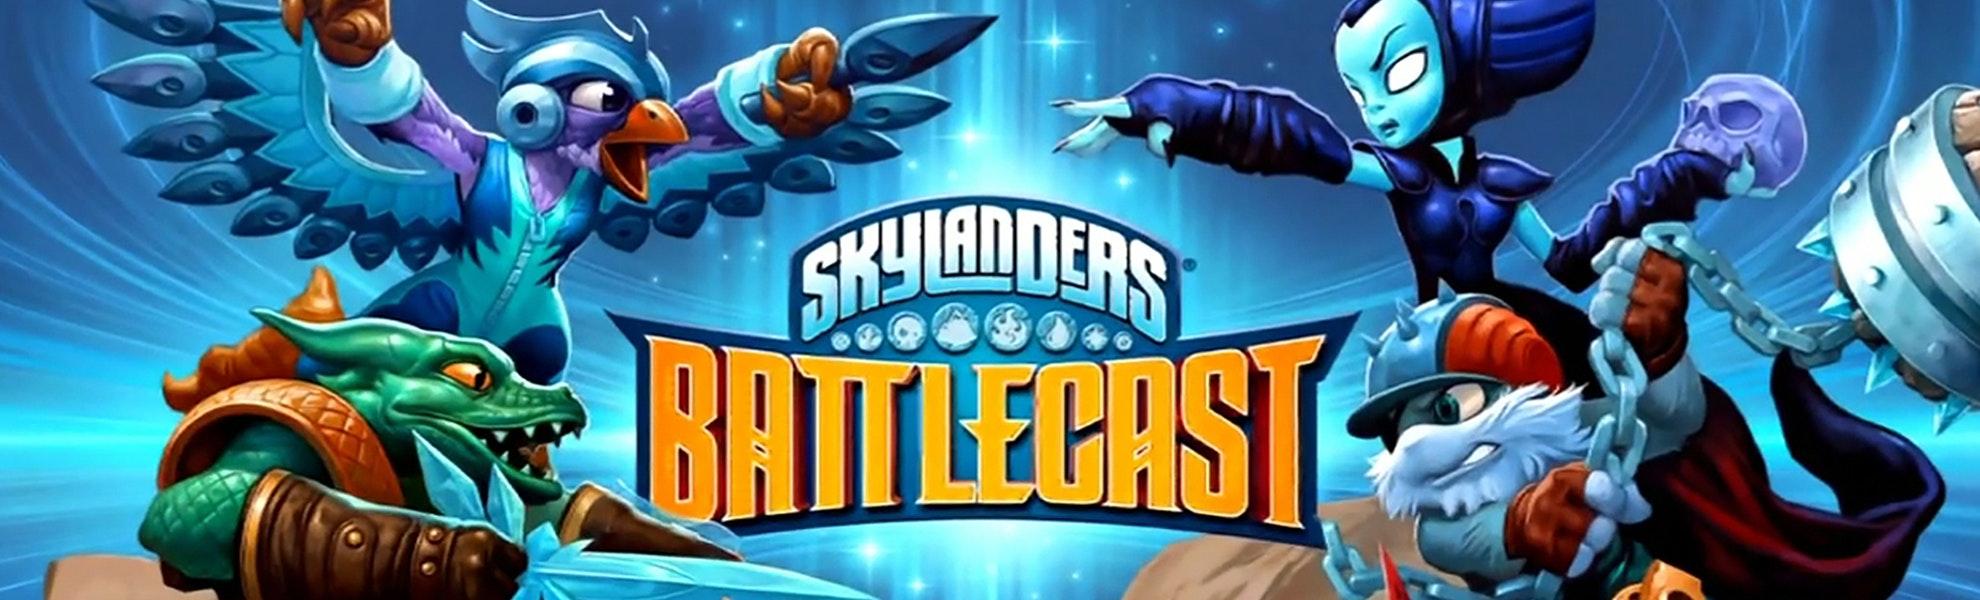 Skylanders Battlecast Bundle